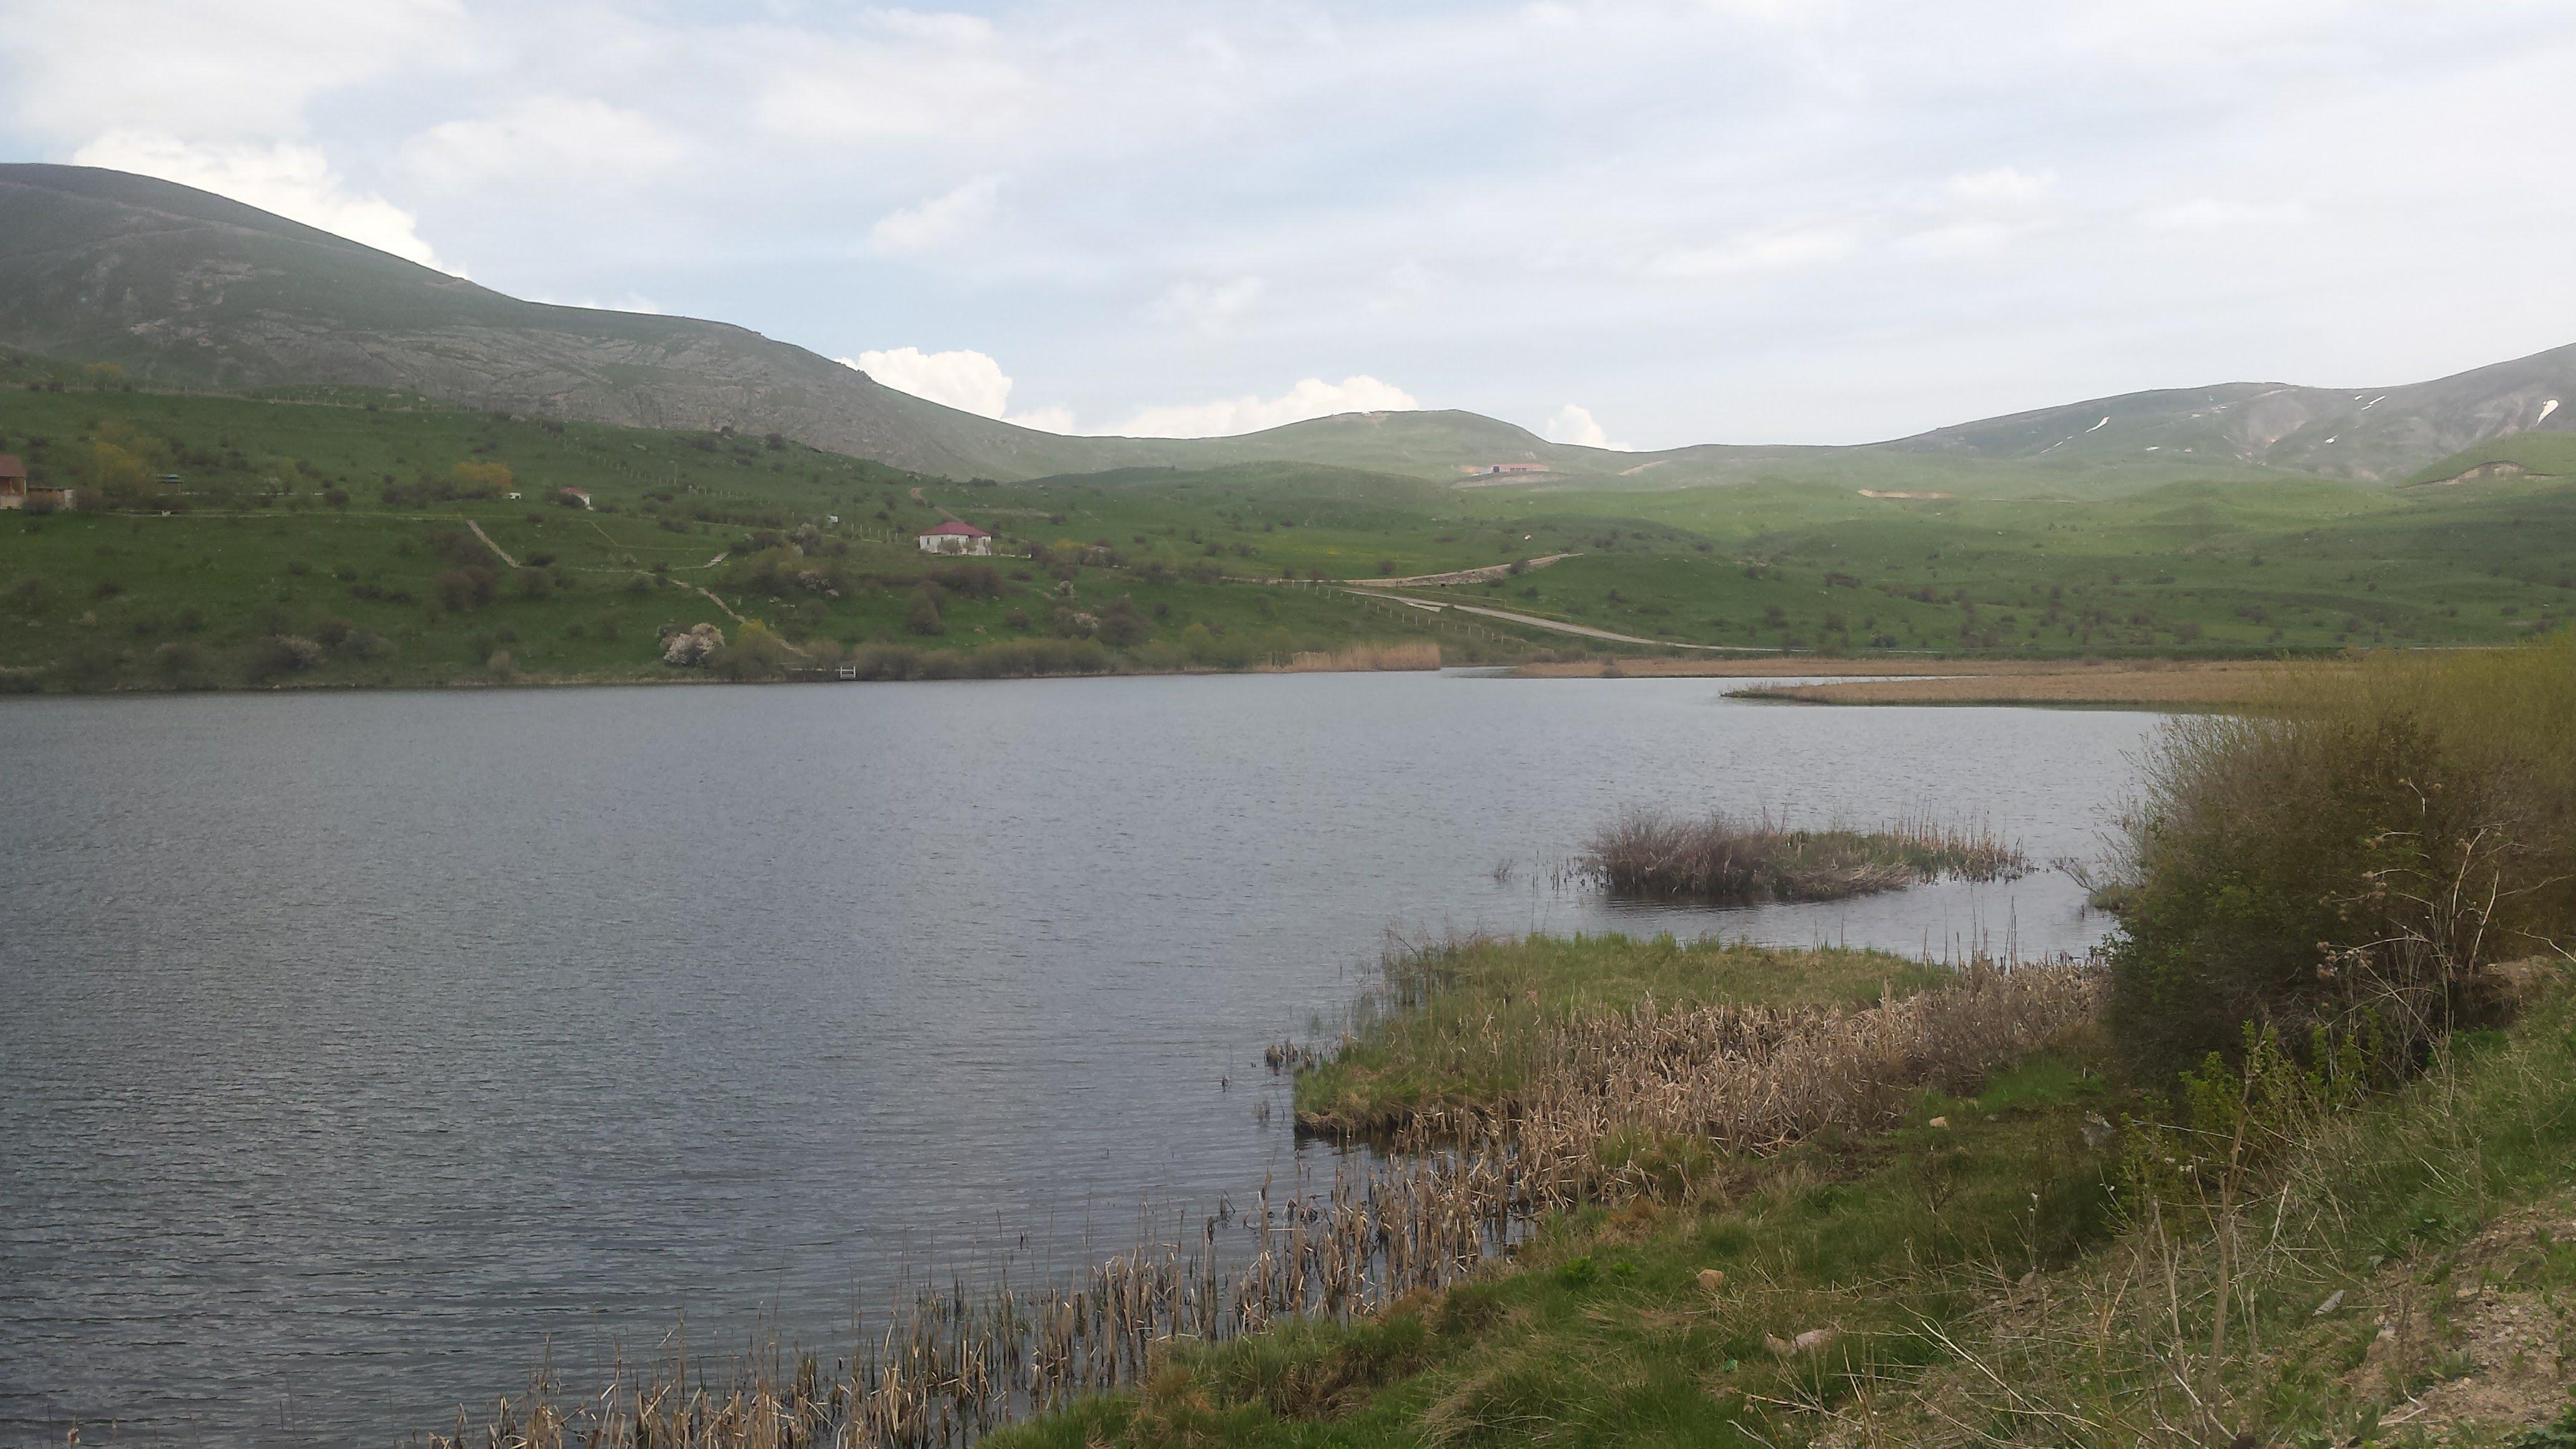 Impressies van Azerbeidzjan (28)